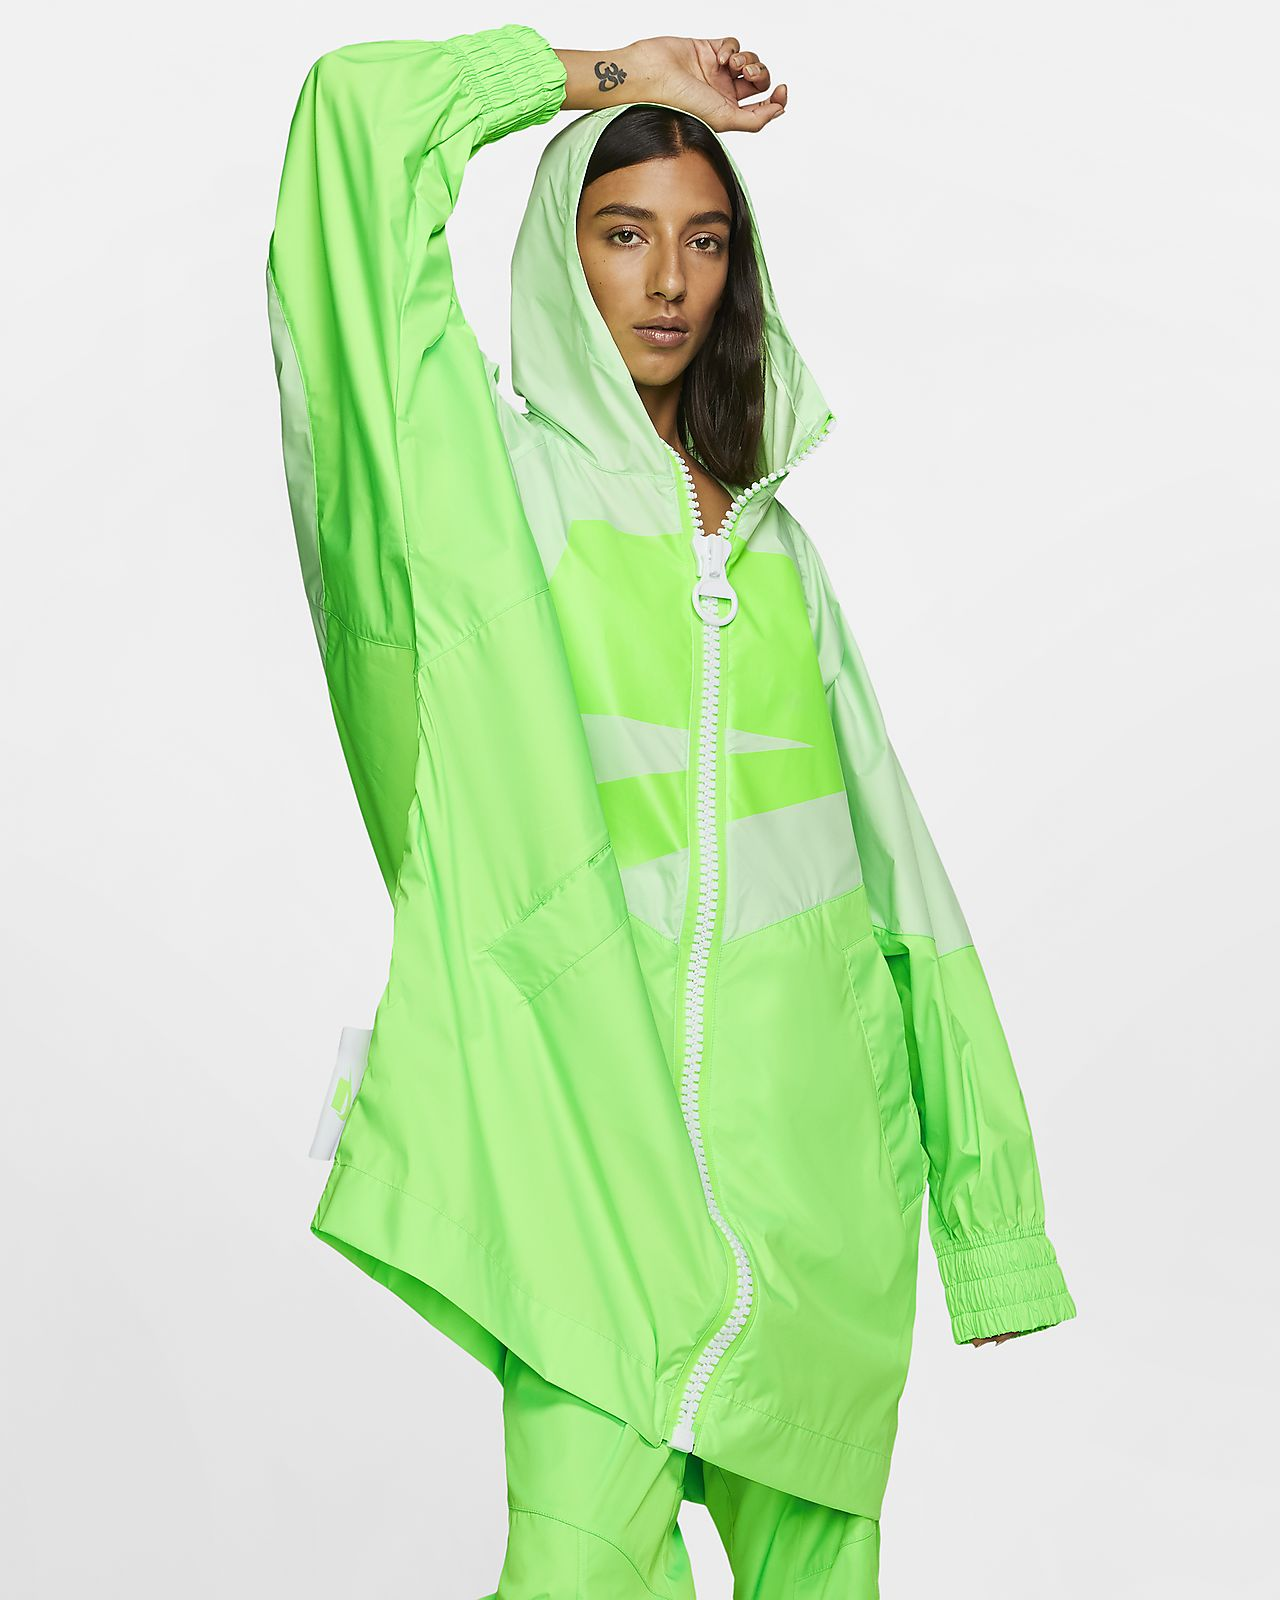 Nike Sportswear NSW Windrunner Damenjacke mit durchgehendem Reißverschluss